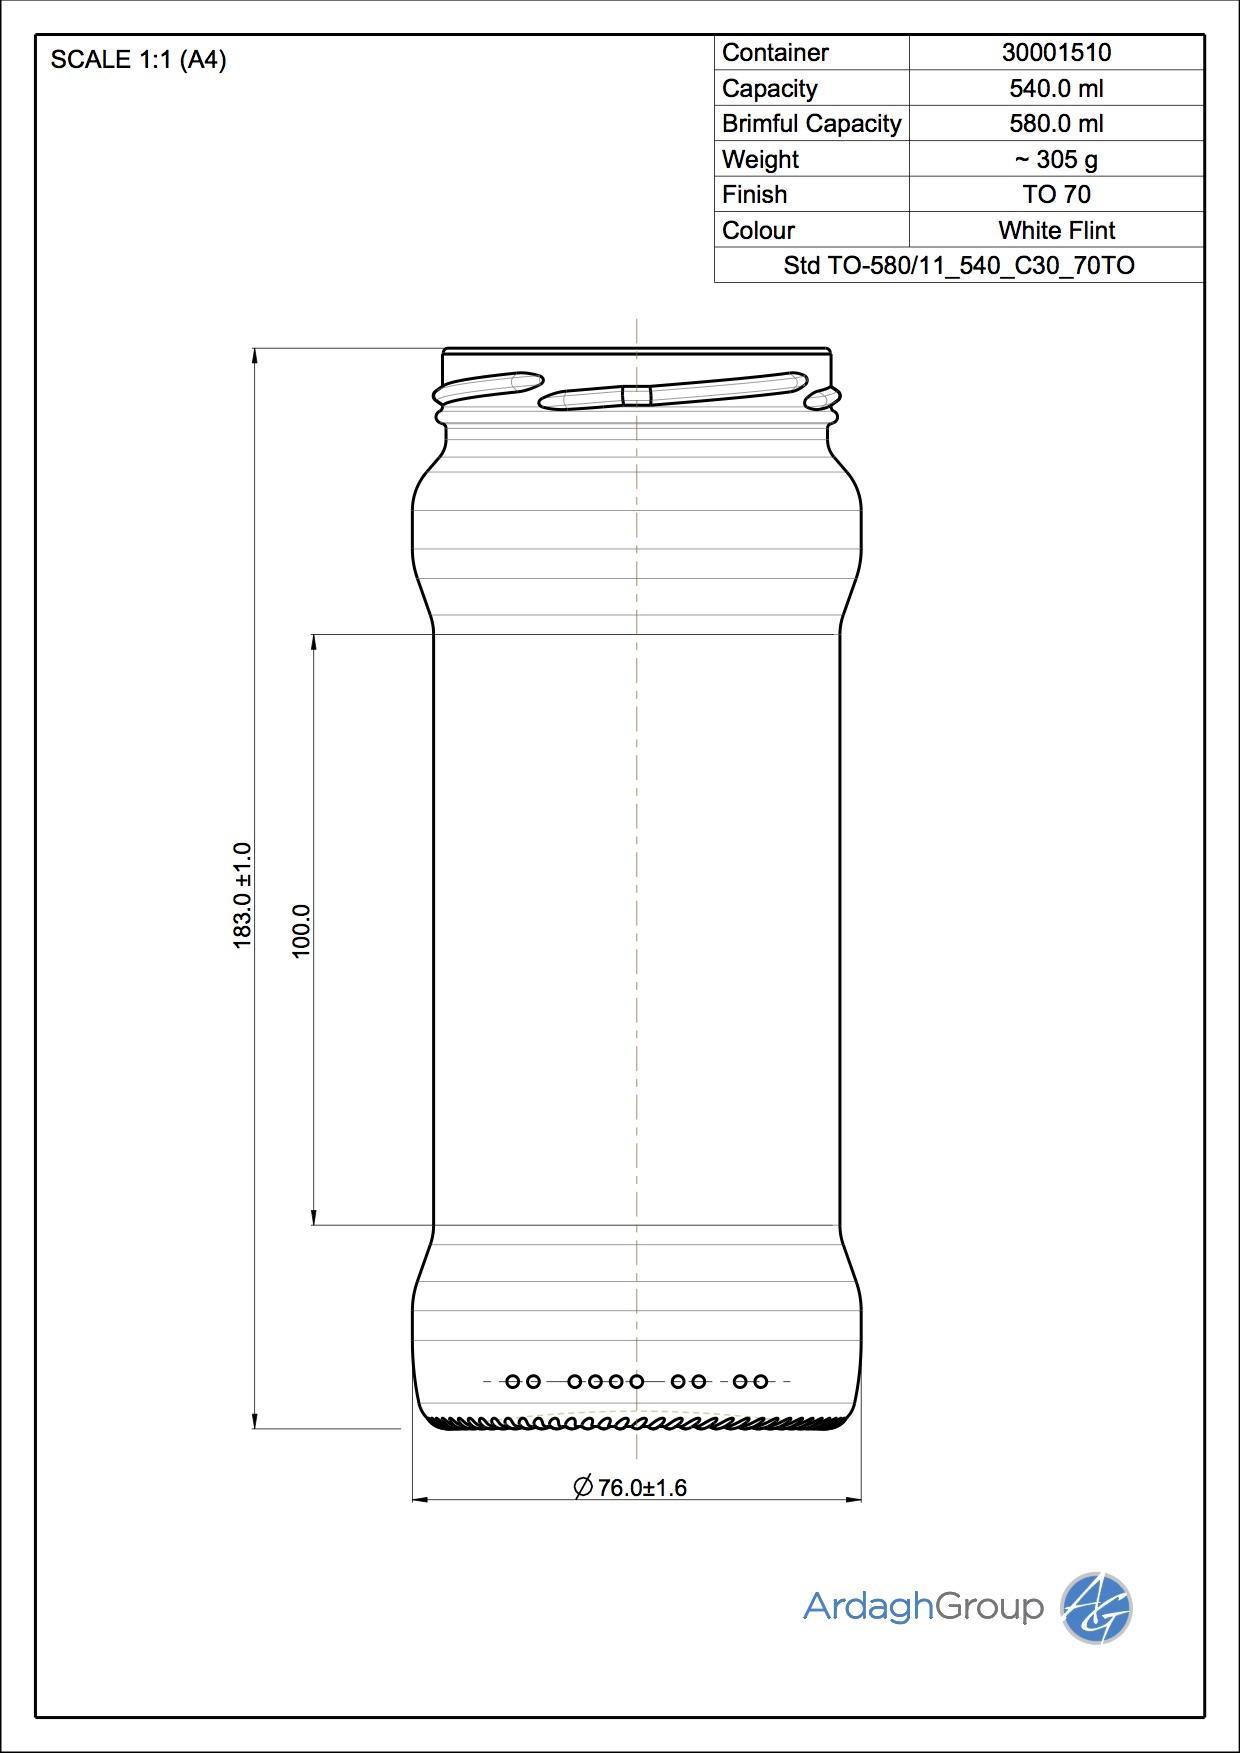 Jar STD05 580 C30 70TO